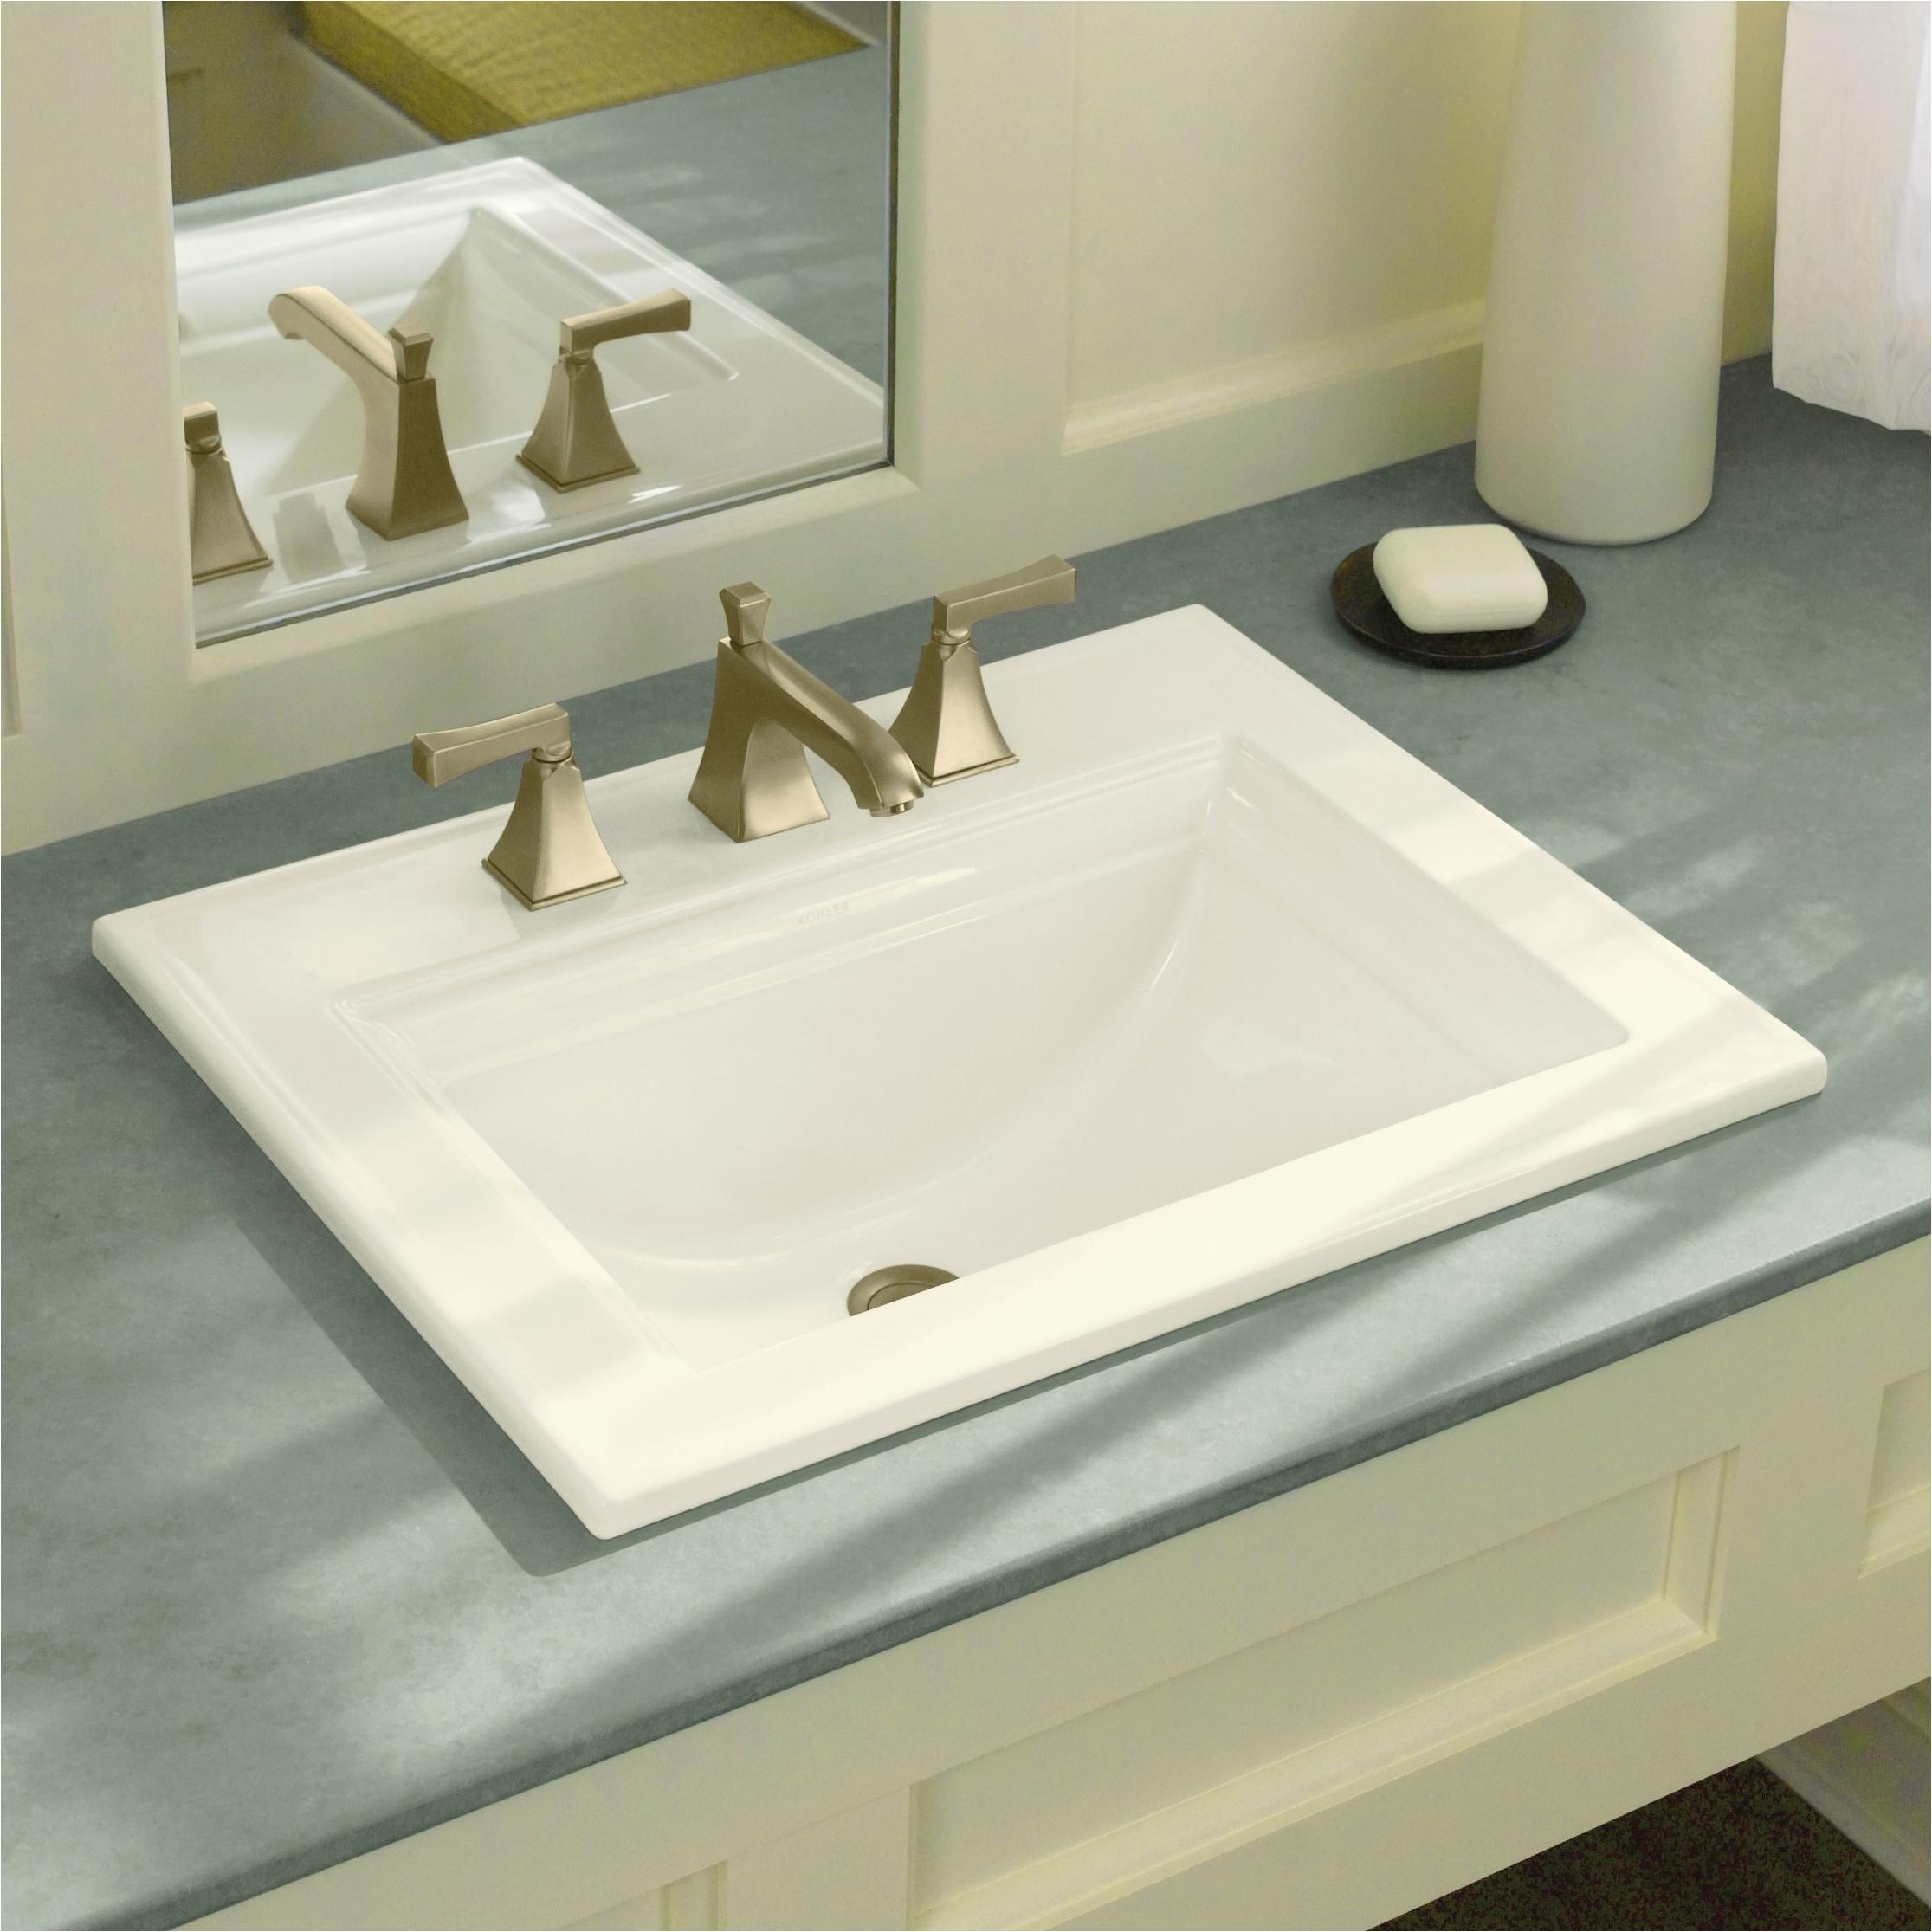 Cheap Bathtubs for Sale Fresh Whirlpool Bathtub Amukraine